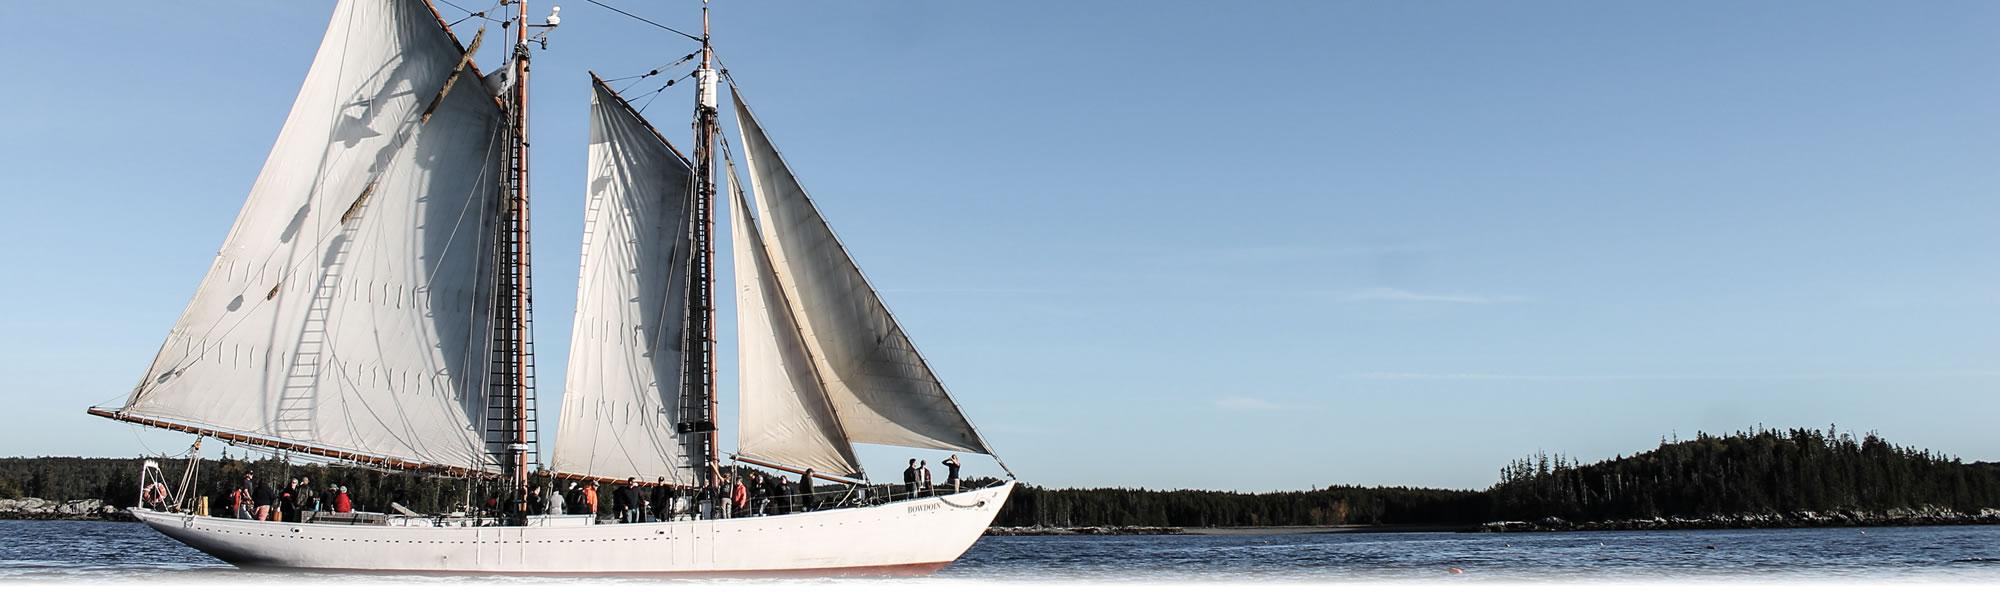 Bowdoin Fall Sails